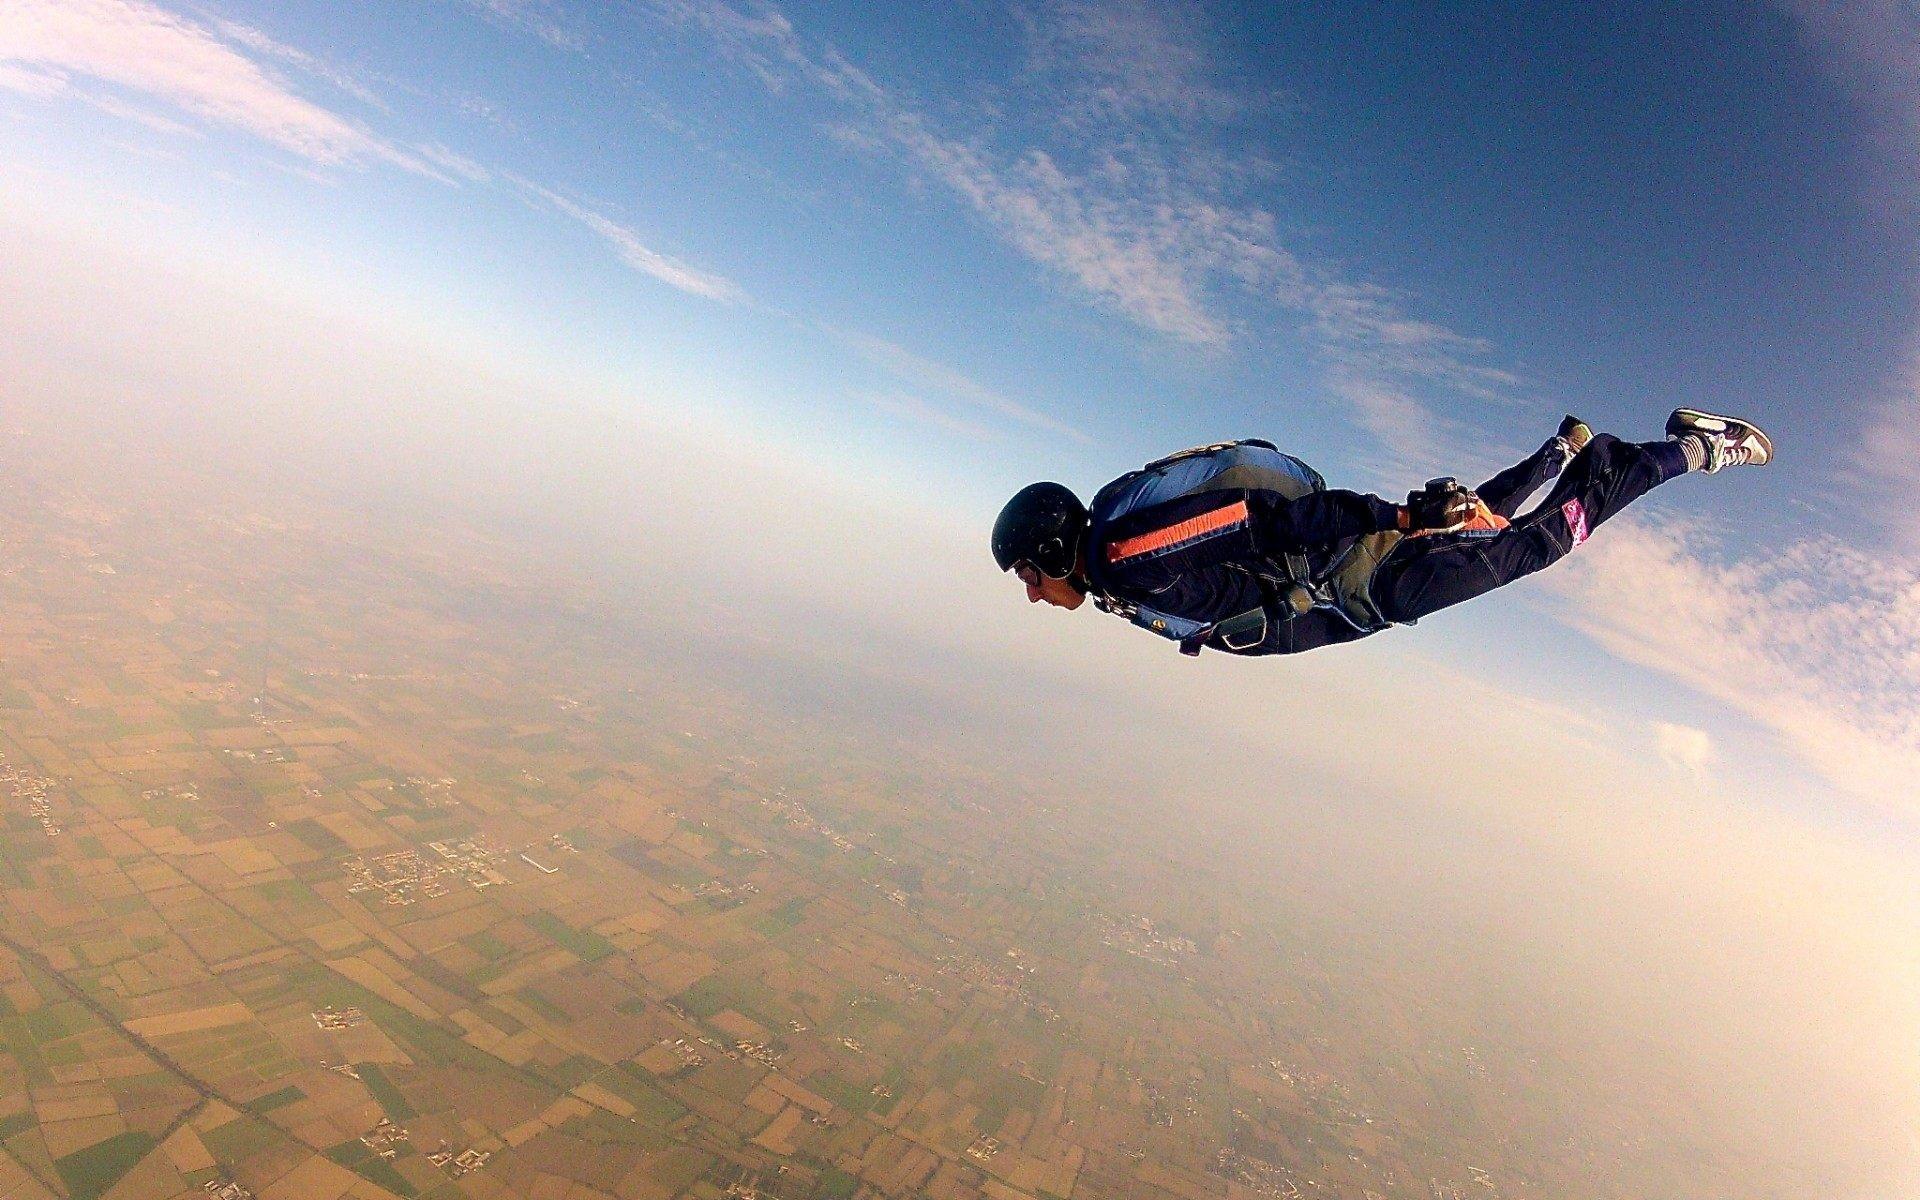 … parachuting skydiver extreme sports wallpaper for desktop …